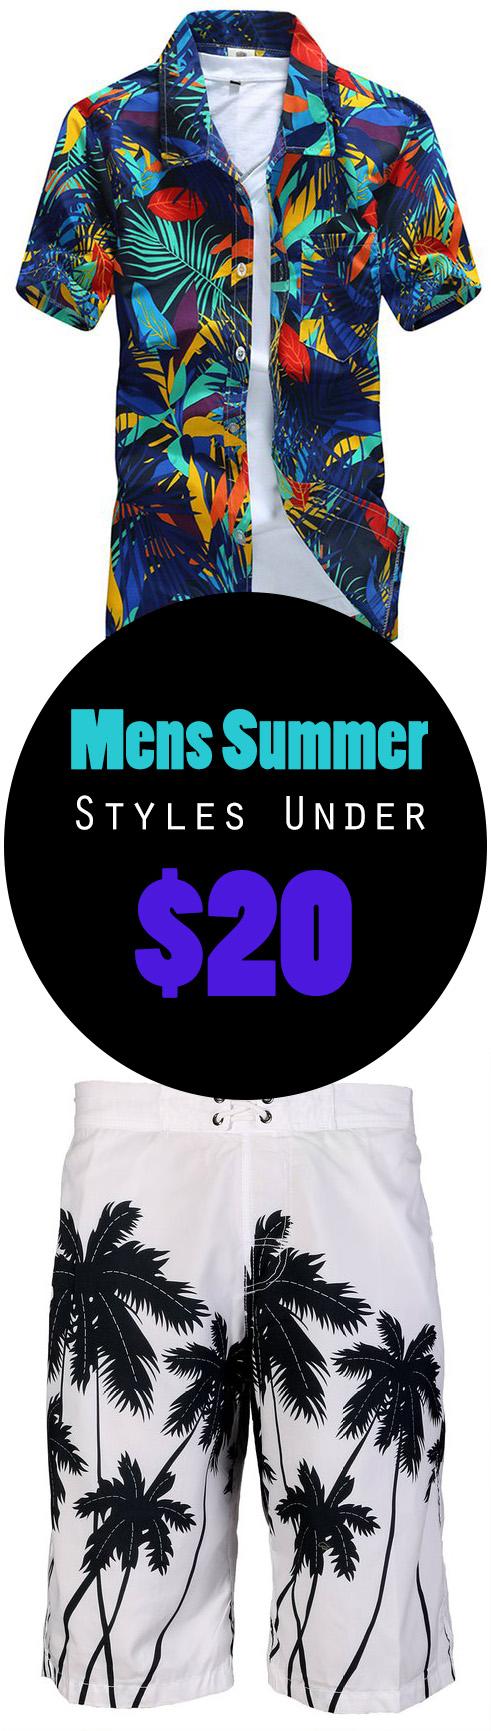 Mens Summer Styles Under 20 - Mens Summer Styles Under $20